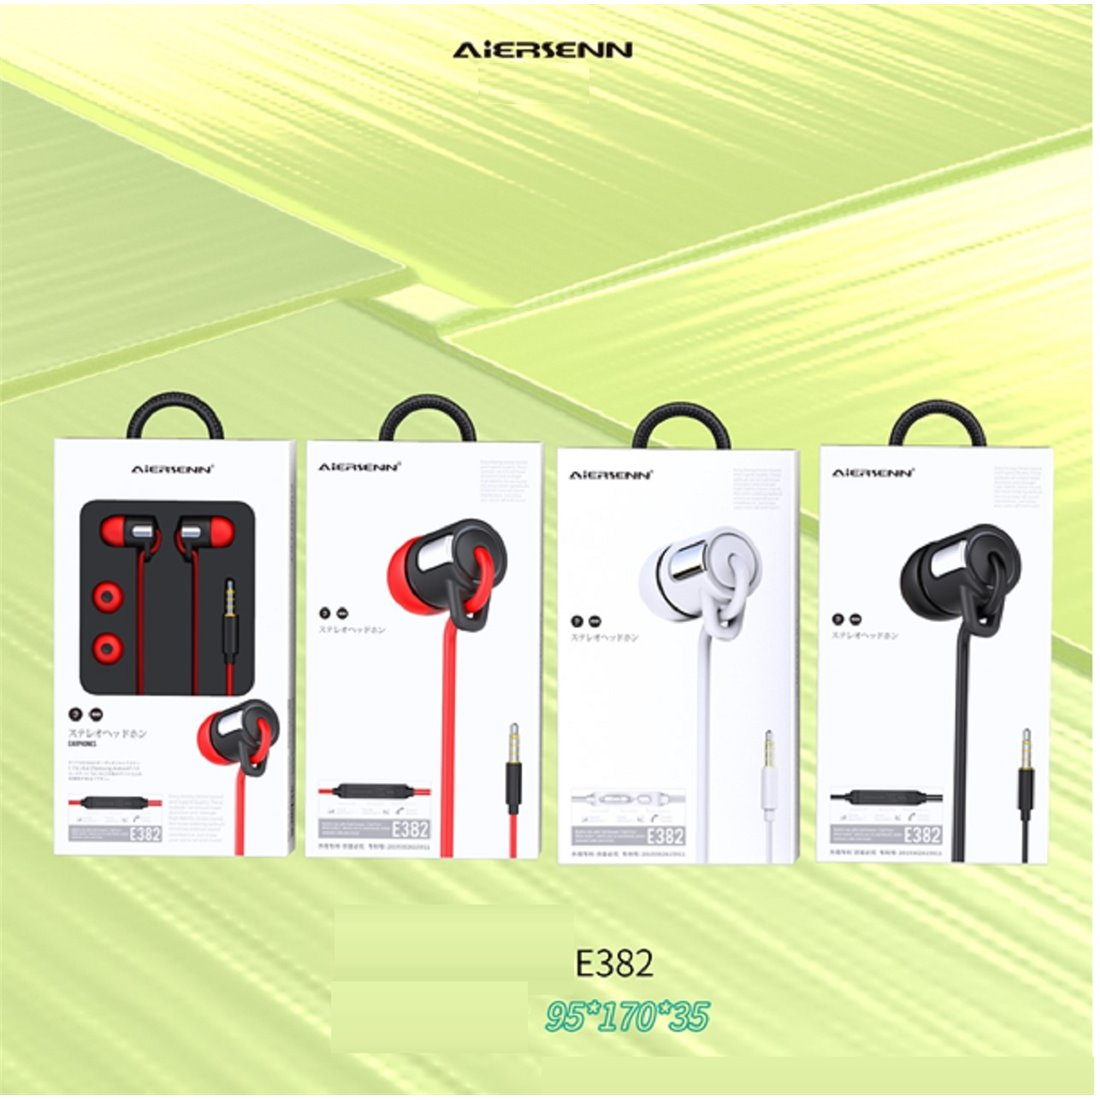 Aiersenn E382 Earphones Music and calls Rood